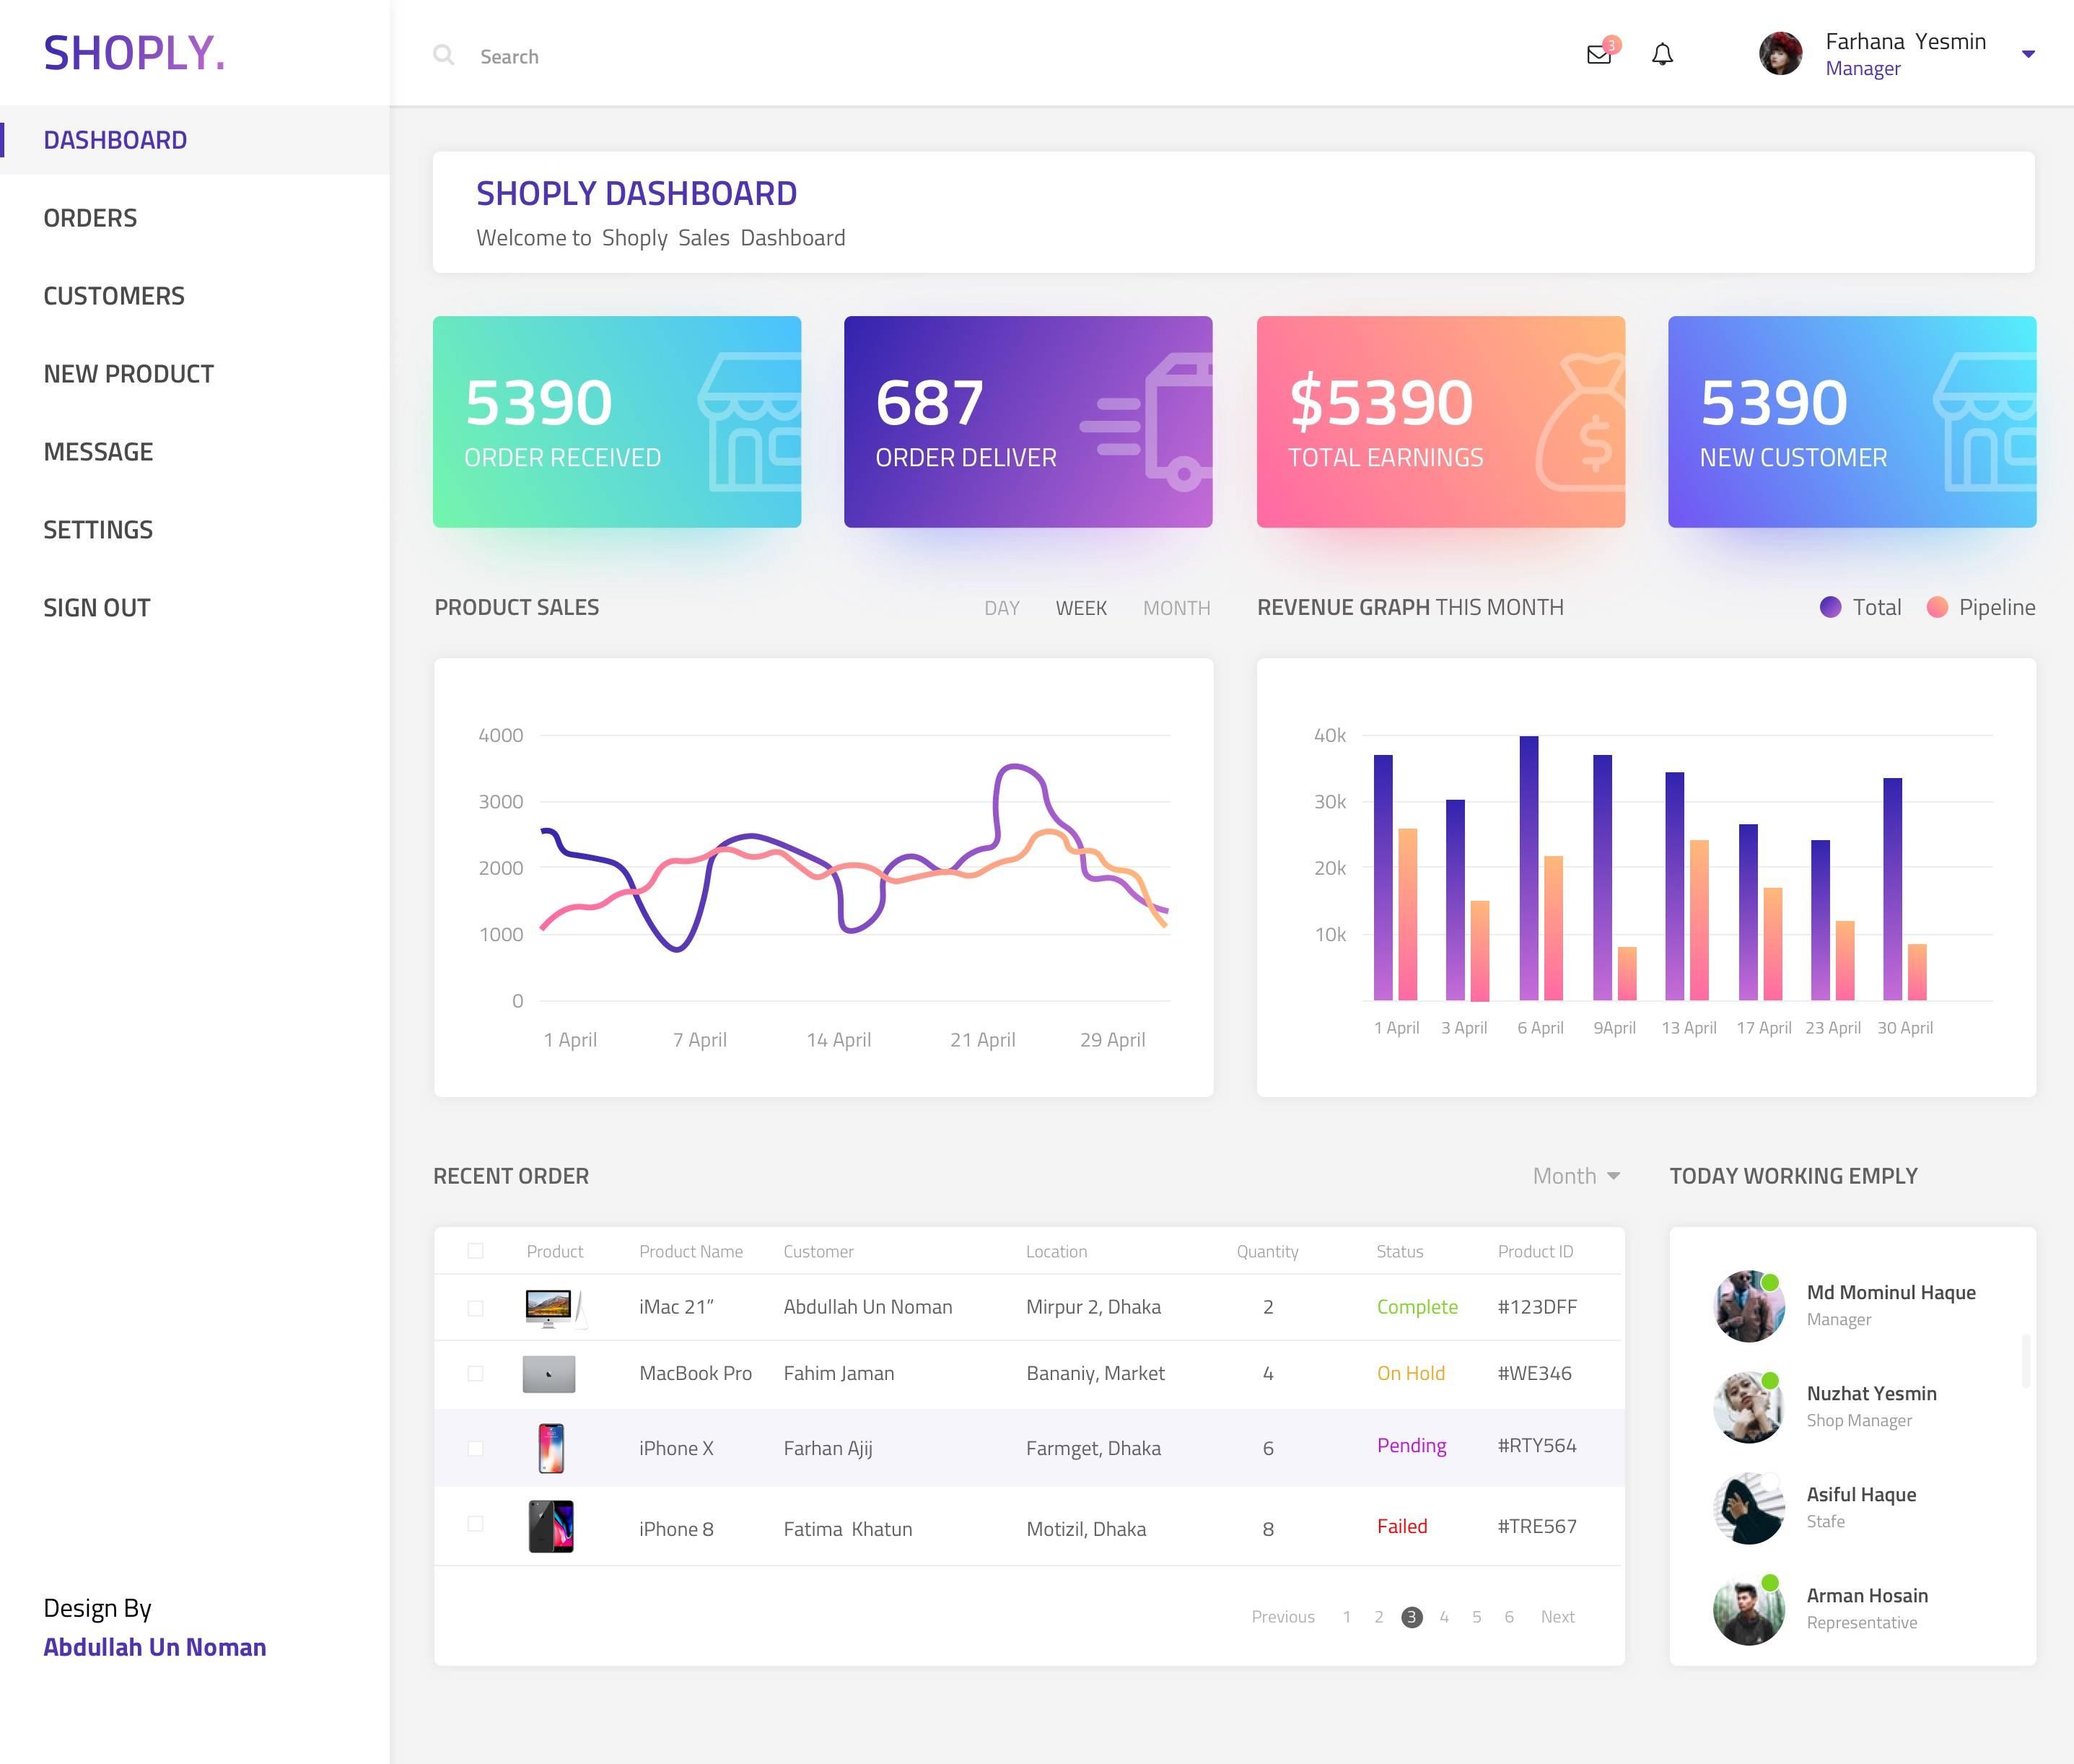 Shoply 后台UI界面设计 sketch素材下载 网页模板-第1张